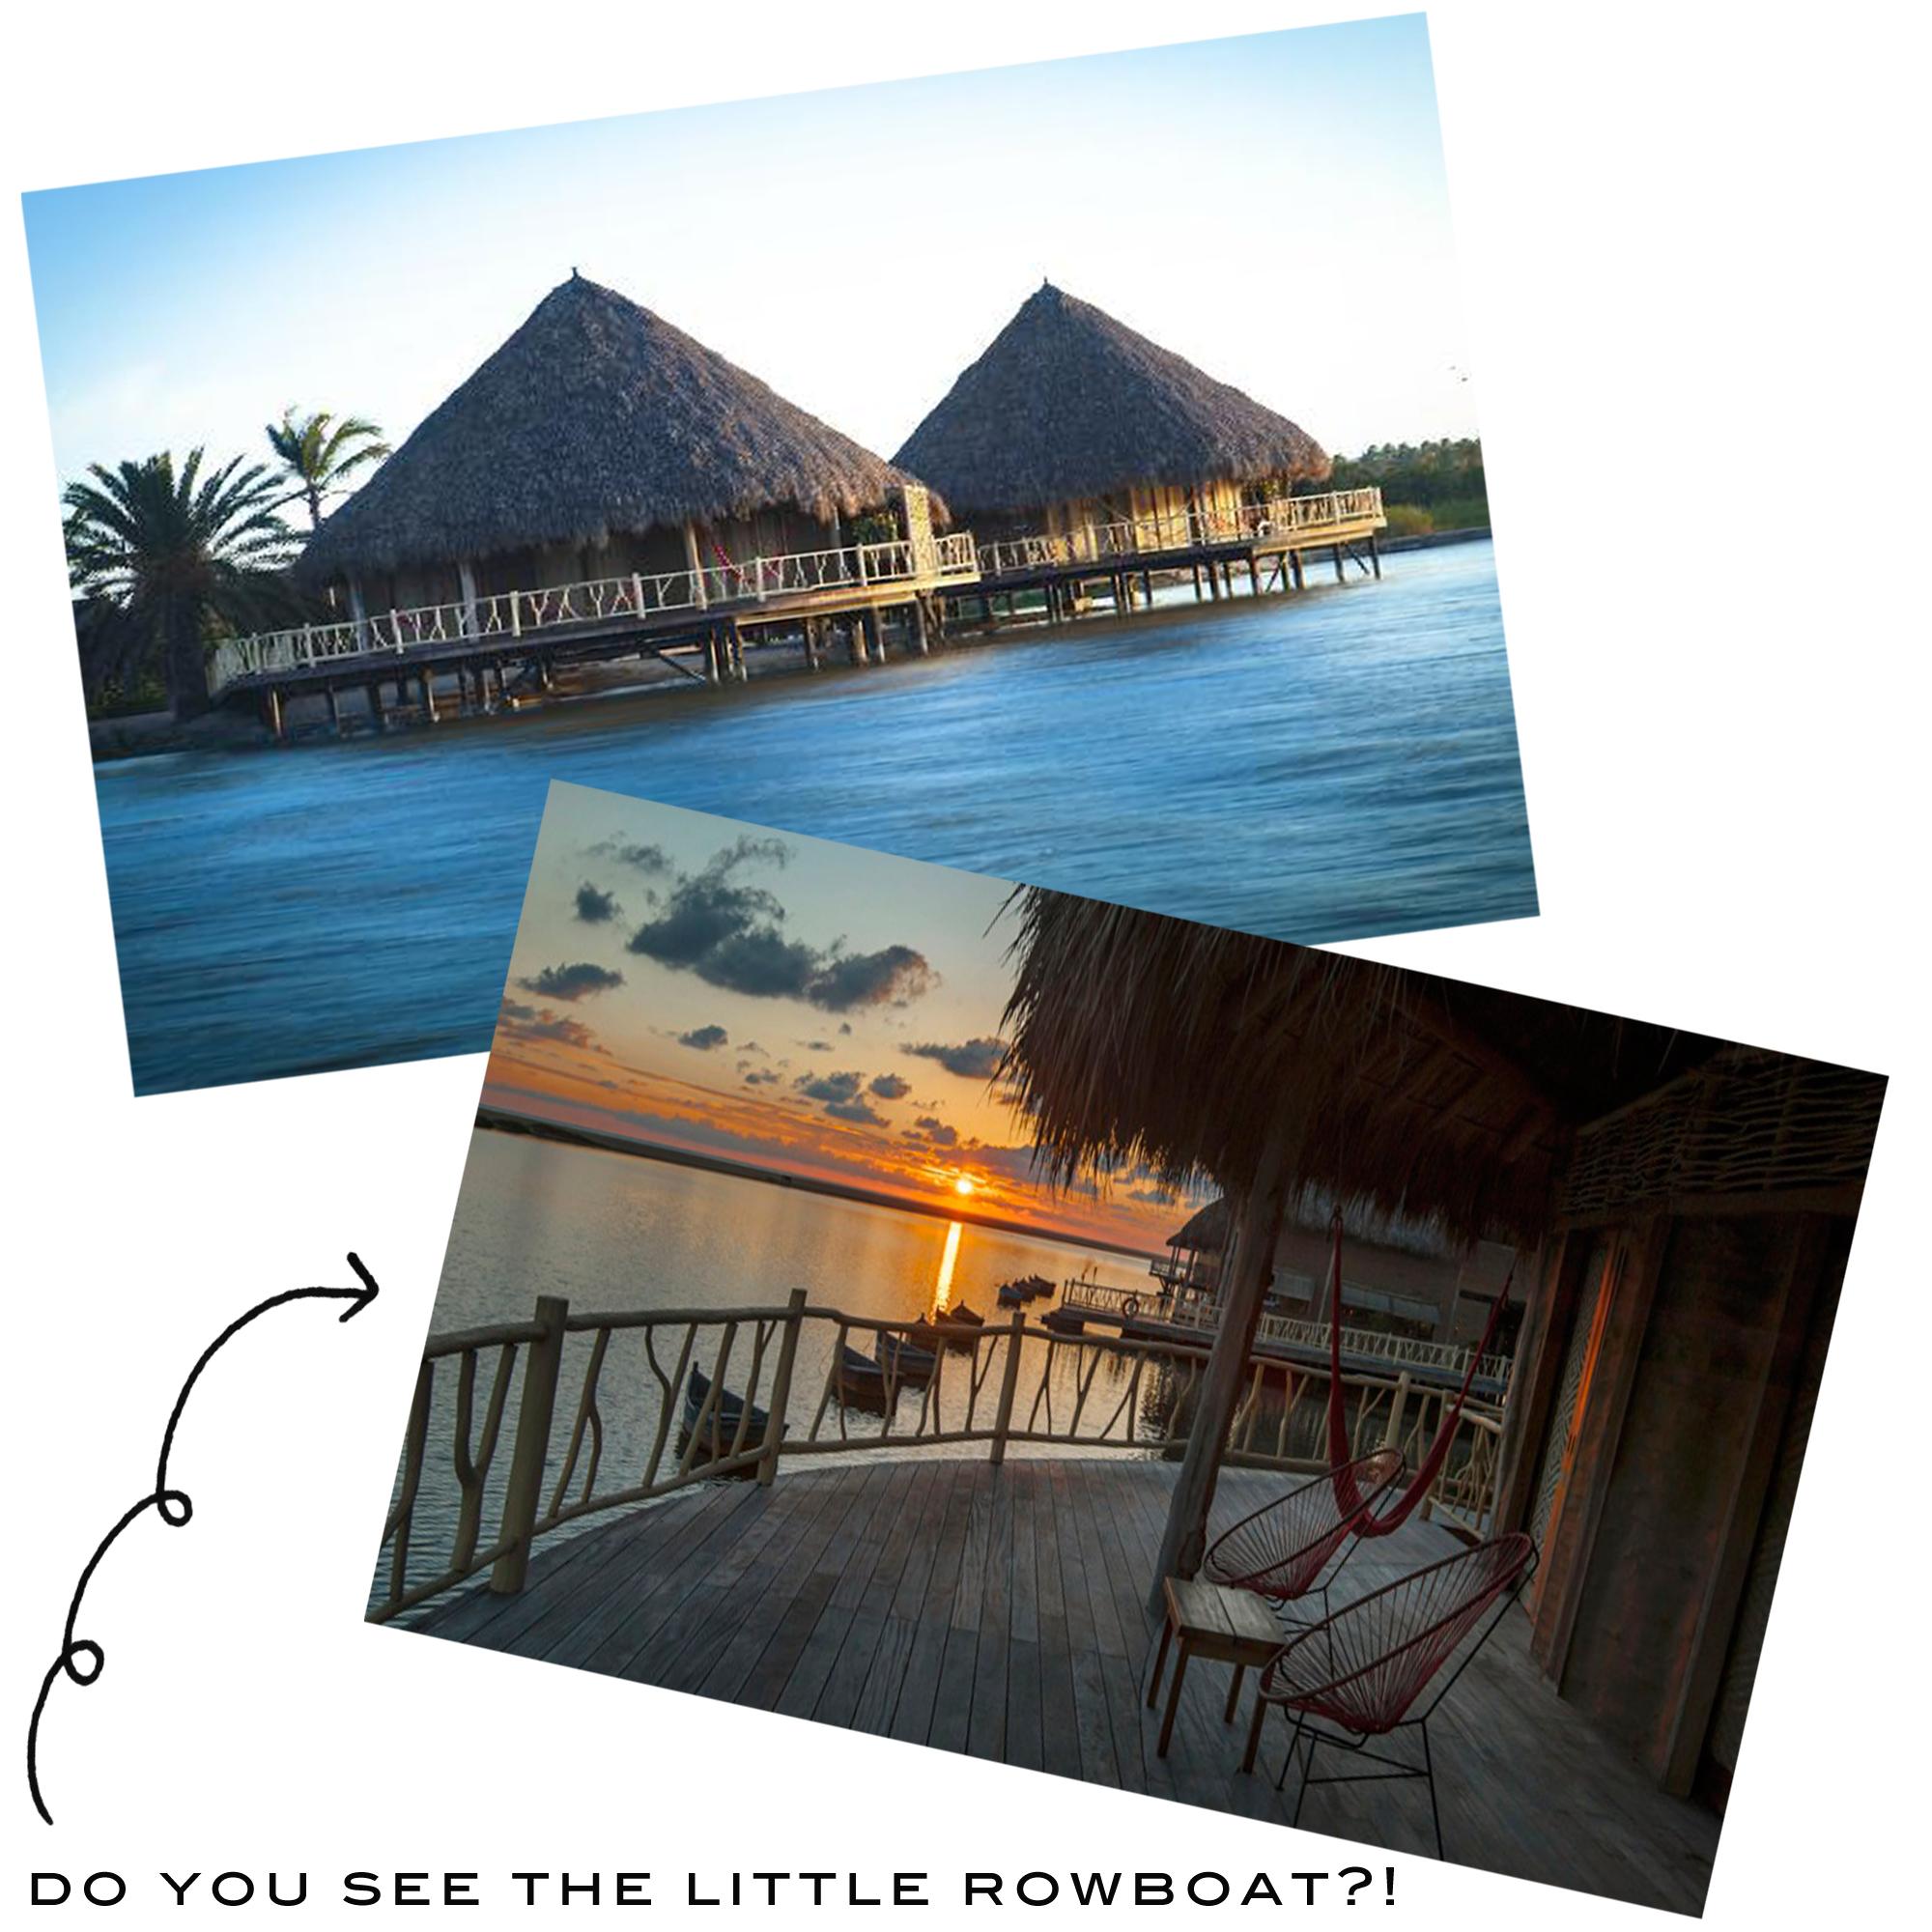 Hotelito online pictures